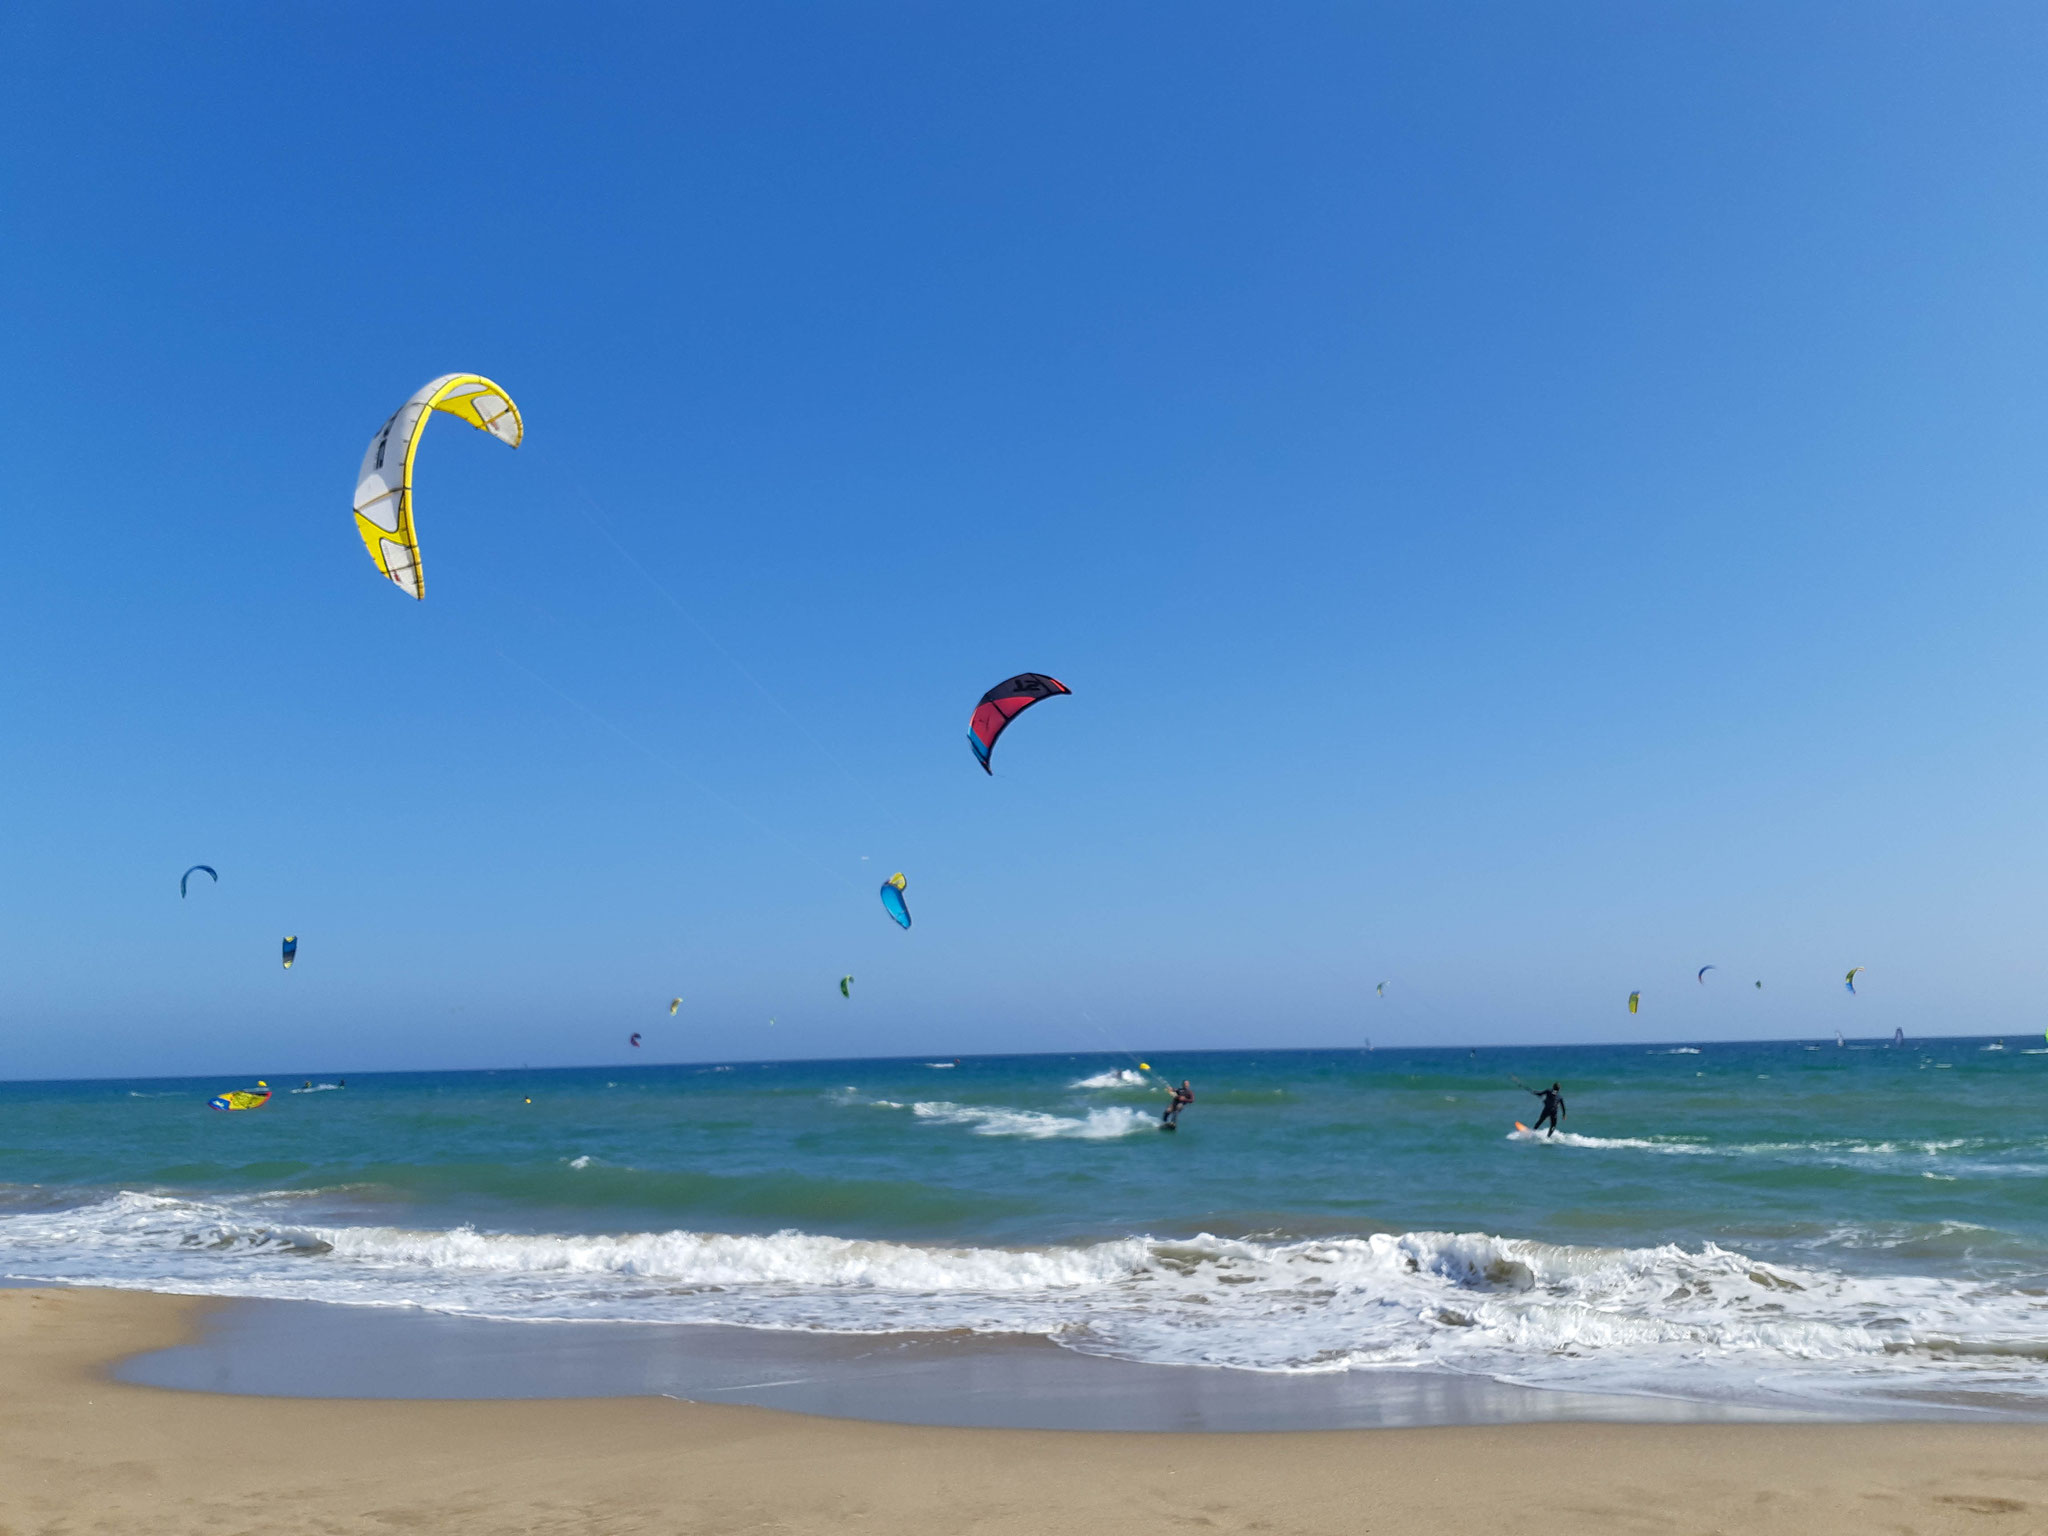 barcelona castelldefels strand surfen wassersport